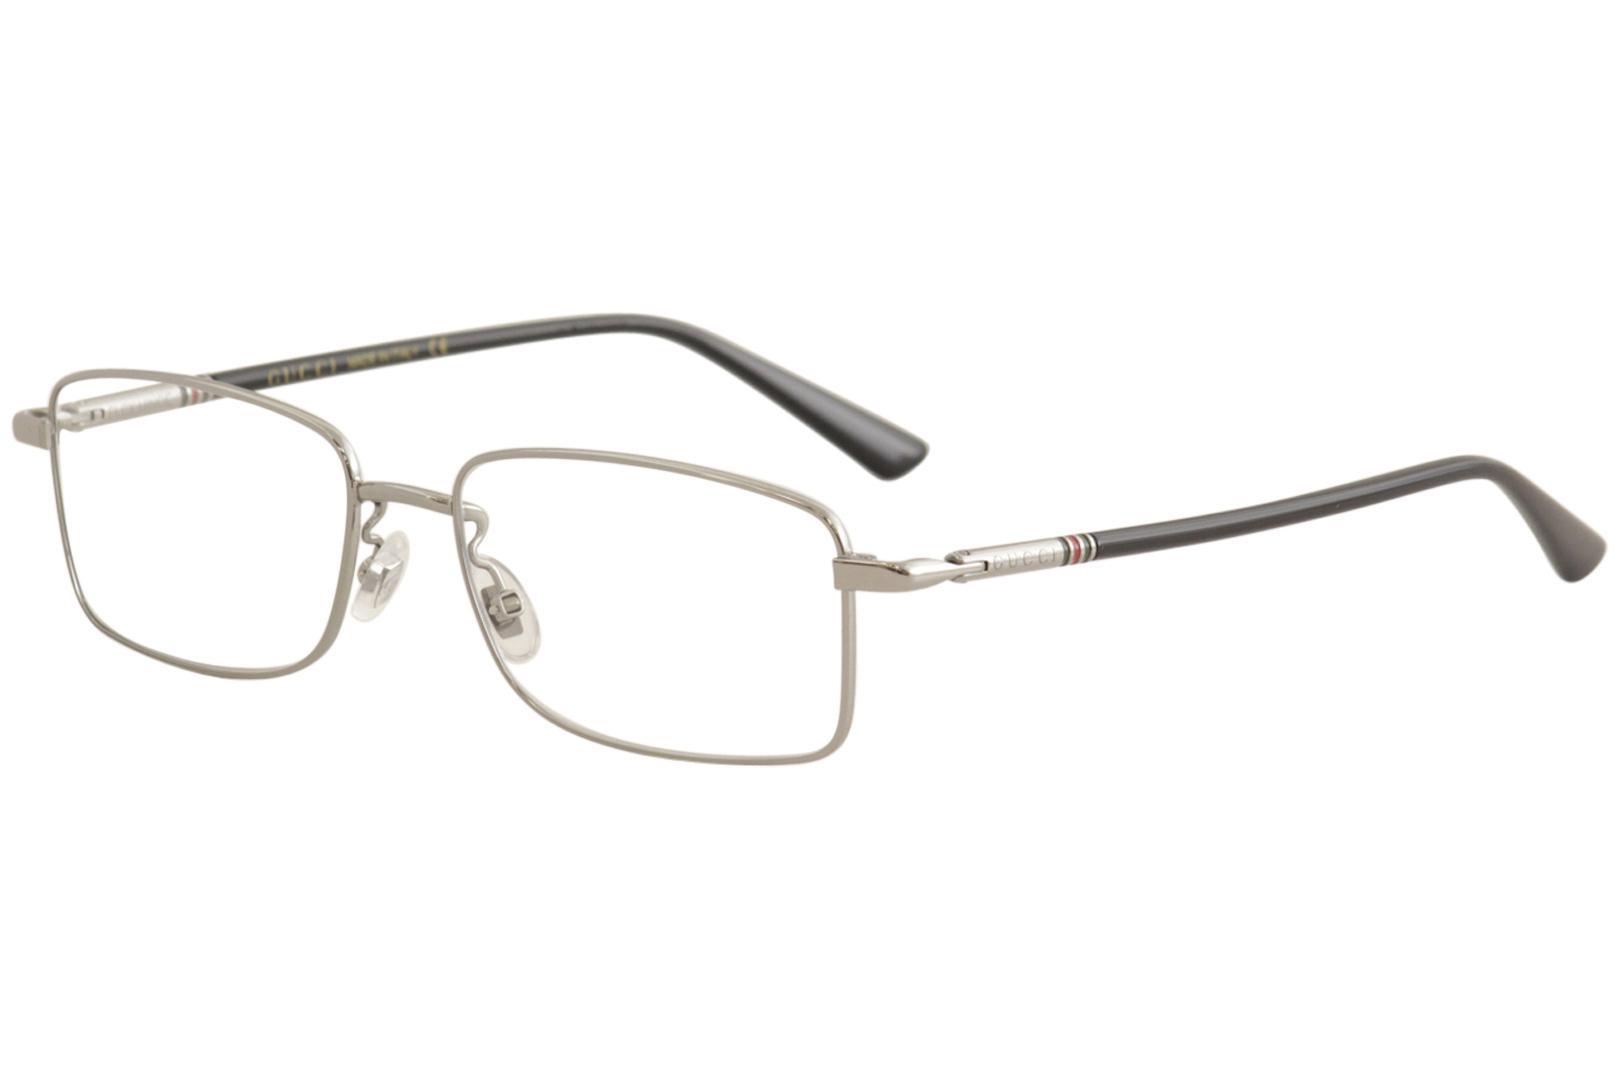 1228af3e3f939 Gucci Men s Eyeglasses GG0391O GG 0391 O Full Rim Optical Frame